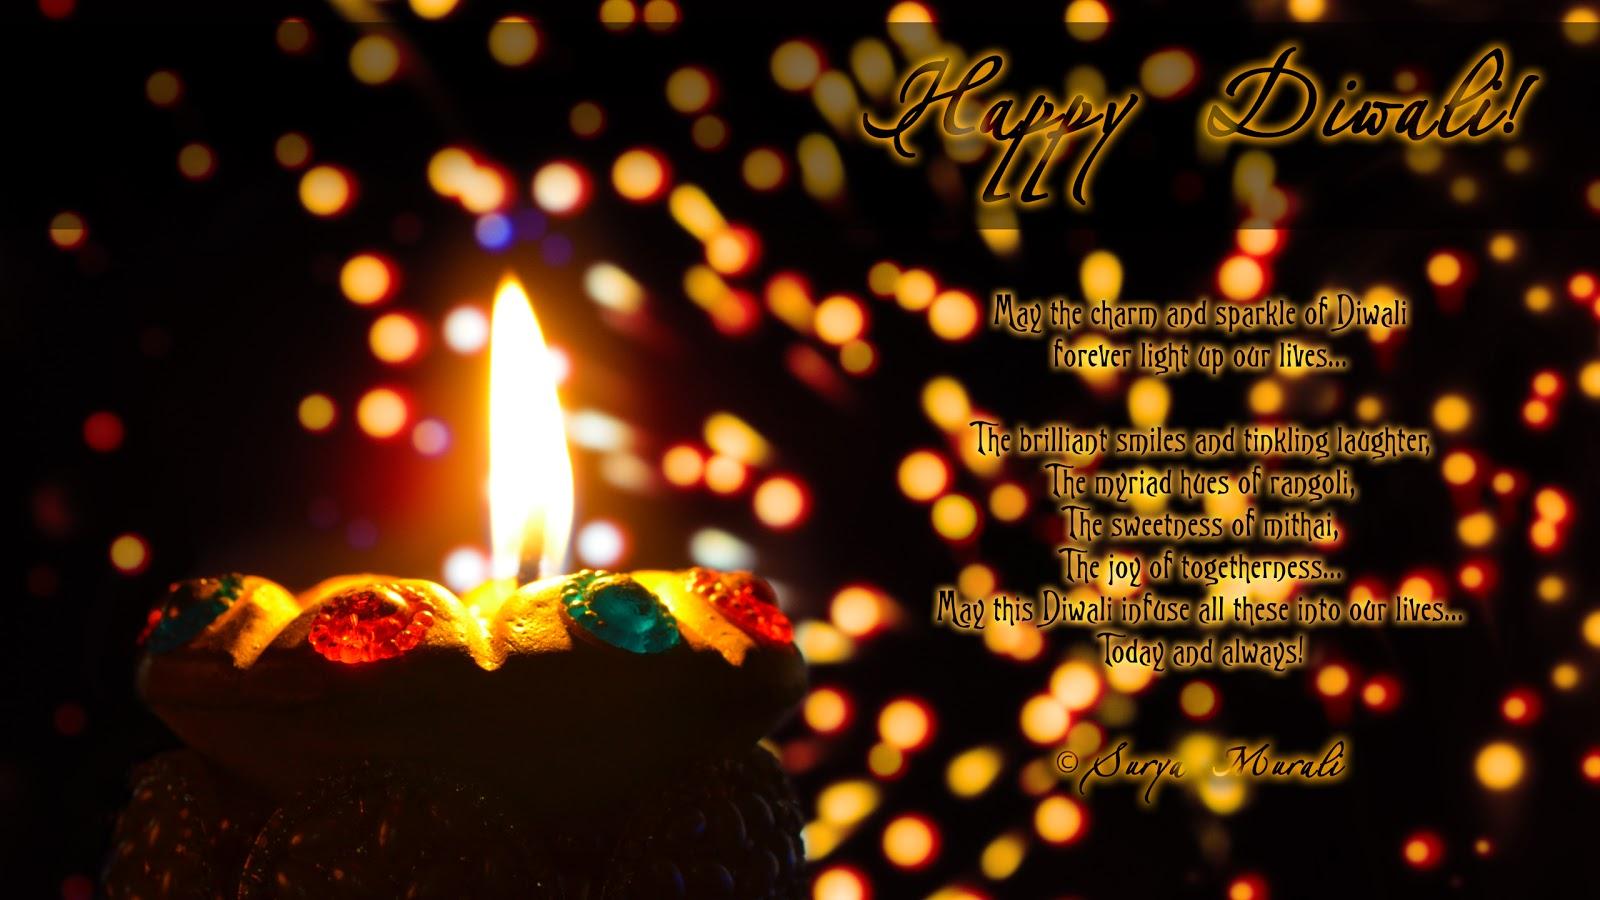 Happy Diwali Wishes Cartoon